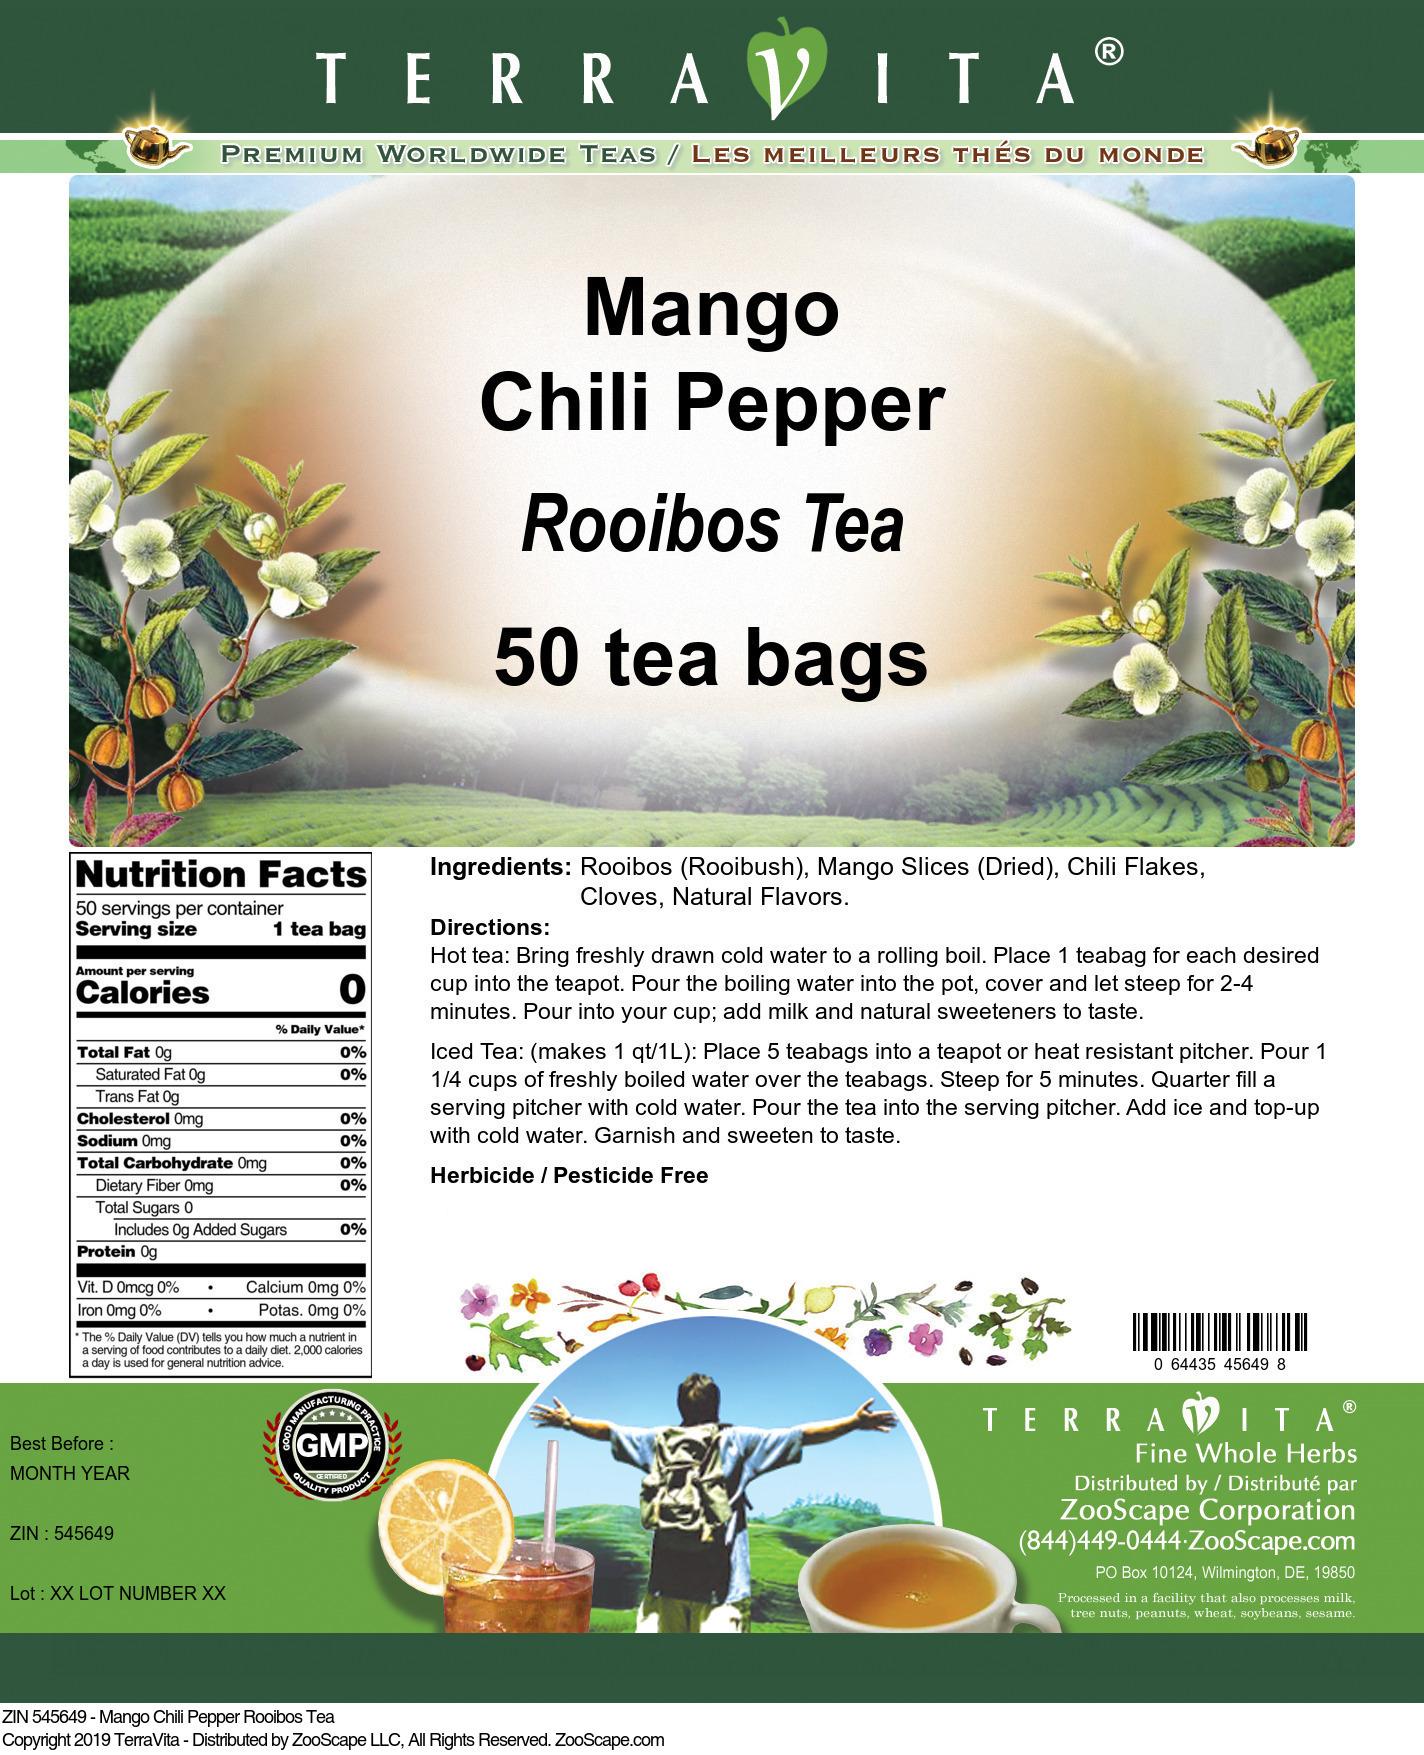 Mango Chili Pepper Rooibos Tea